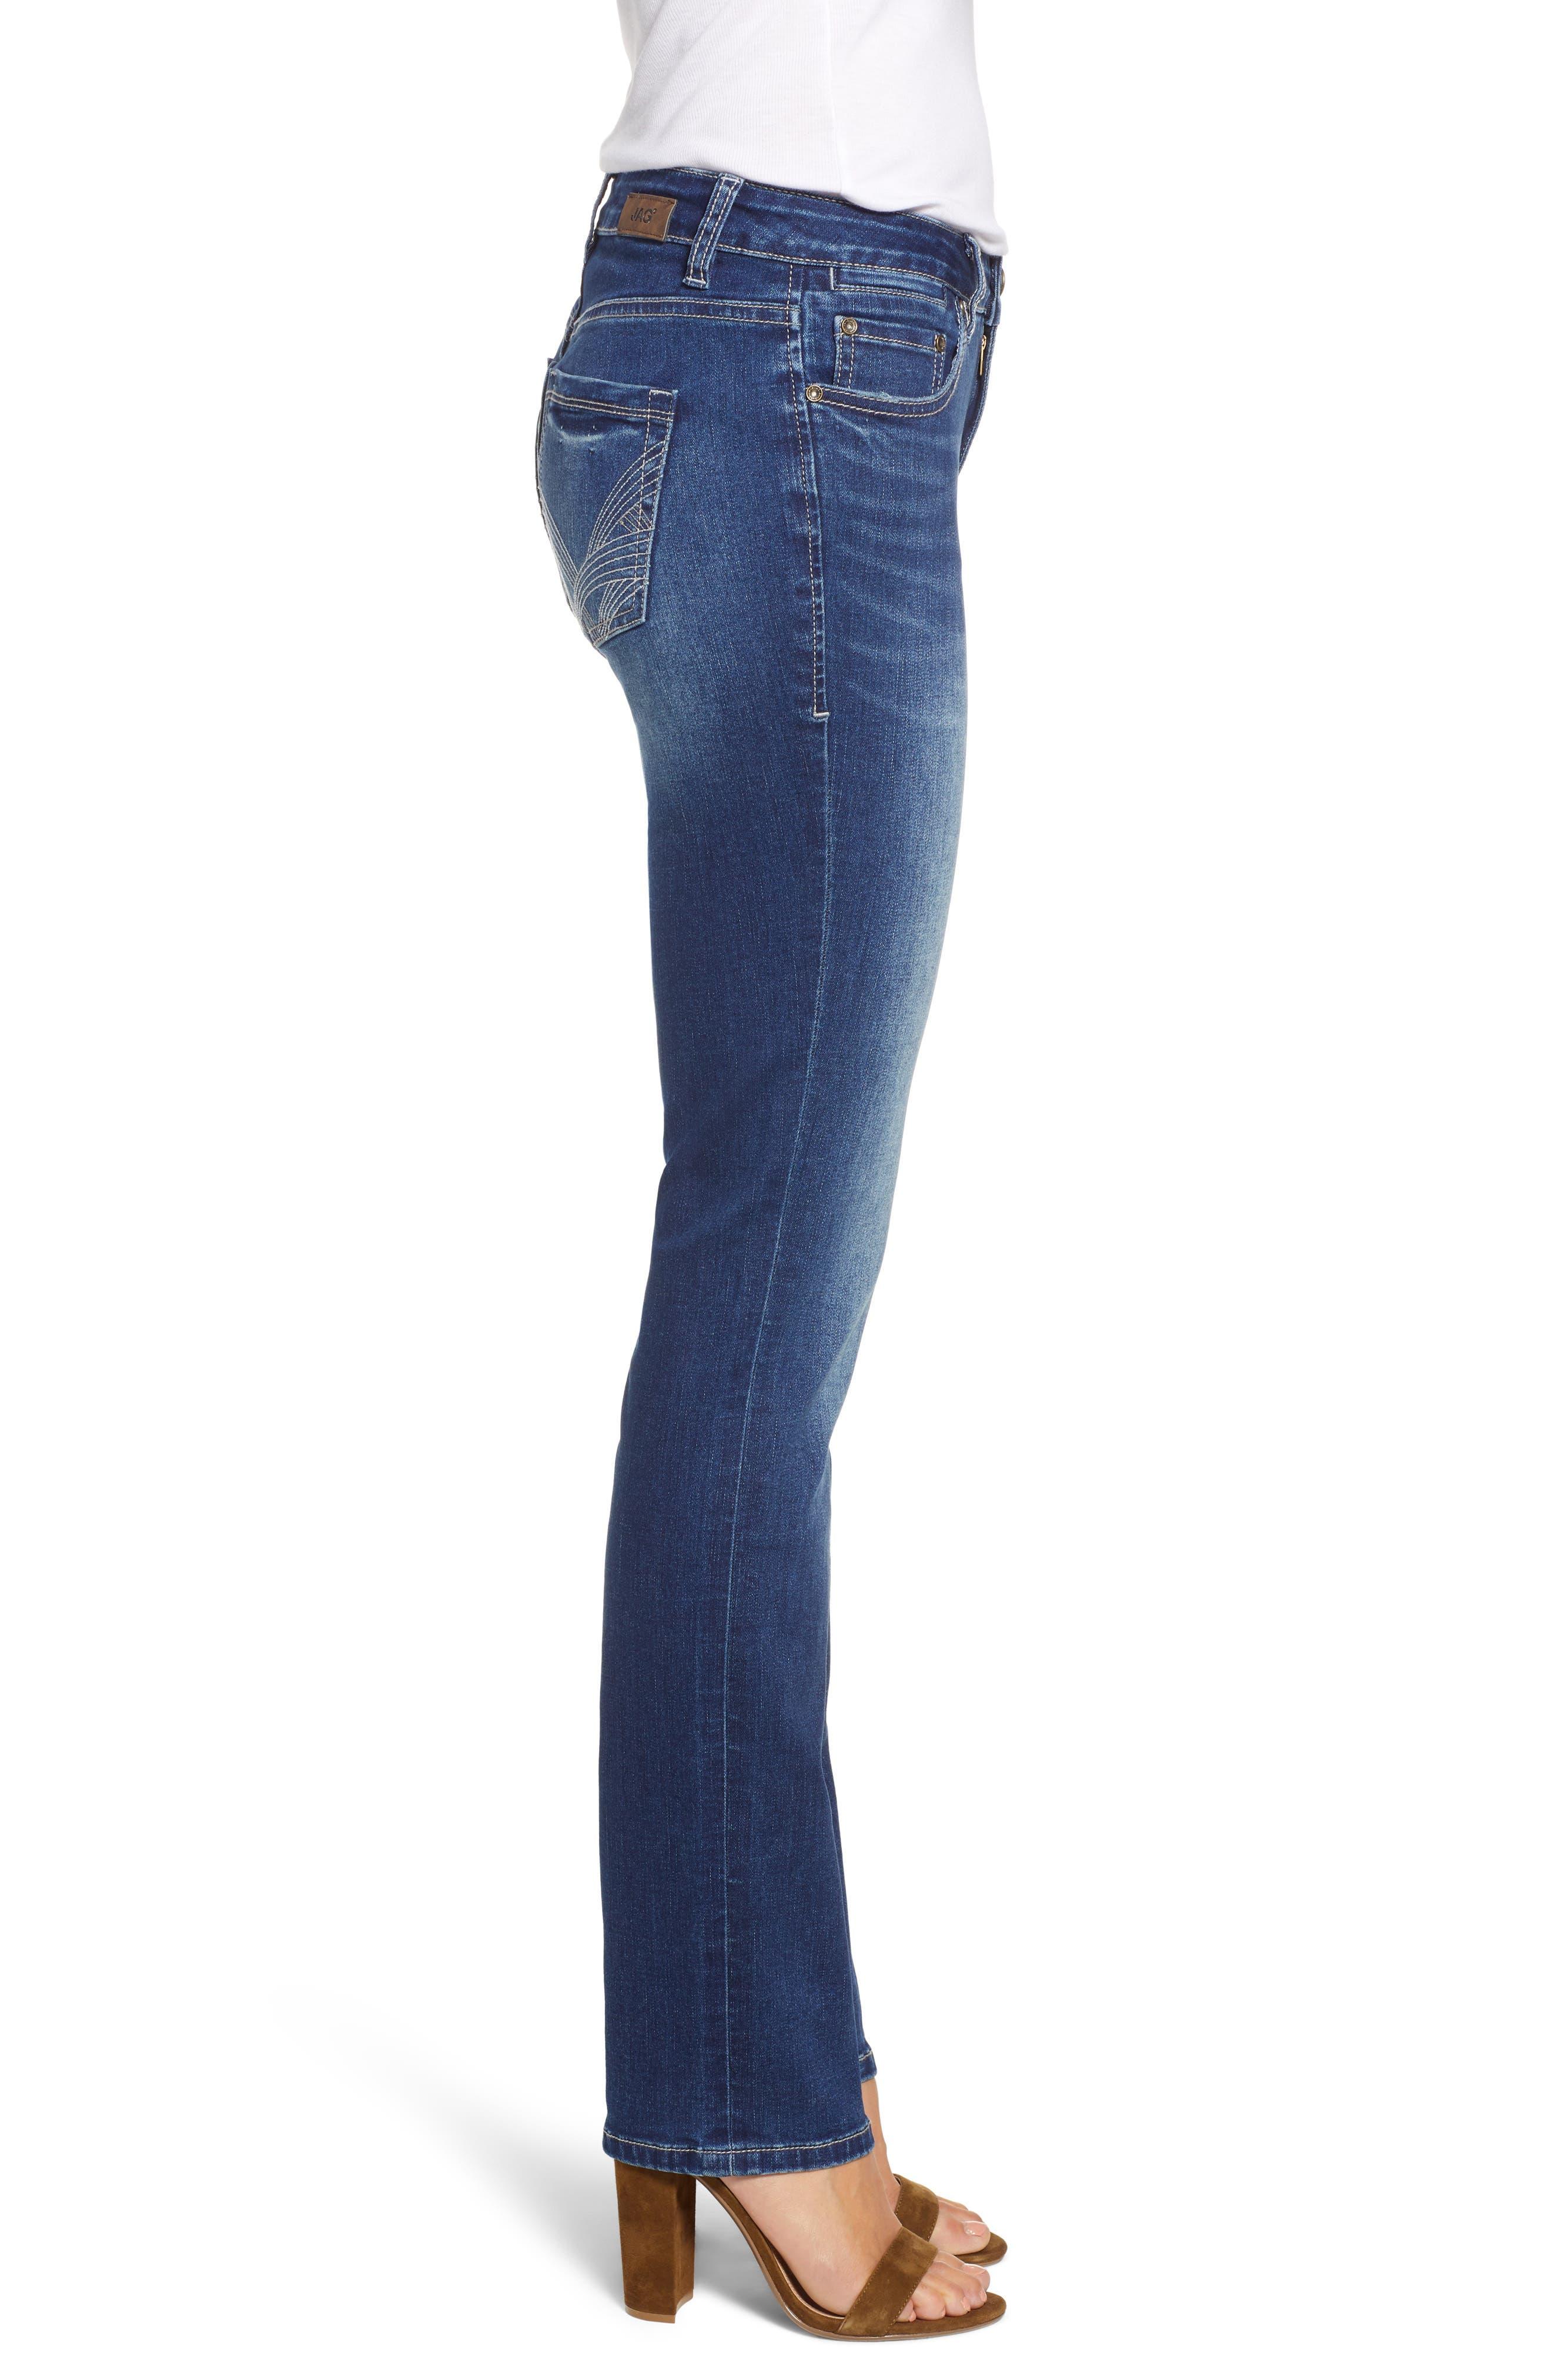 JAG JEANS, Hanna Stretch Straight Leg Jeans, Alternate thumbnail 4, color, MED INDIGO